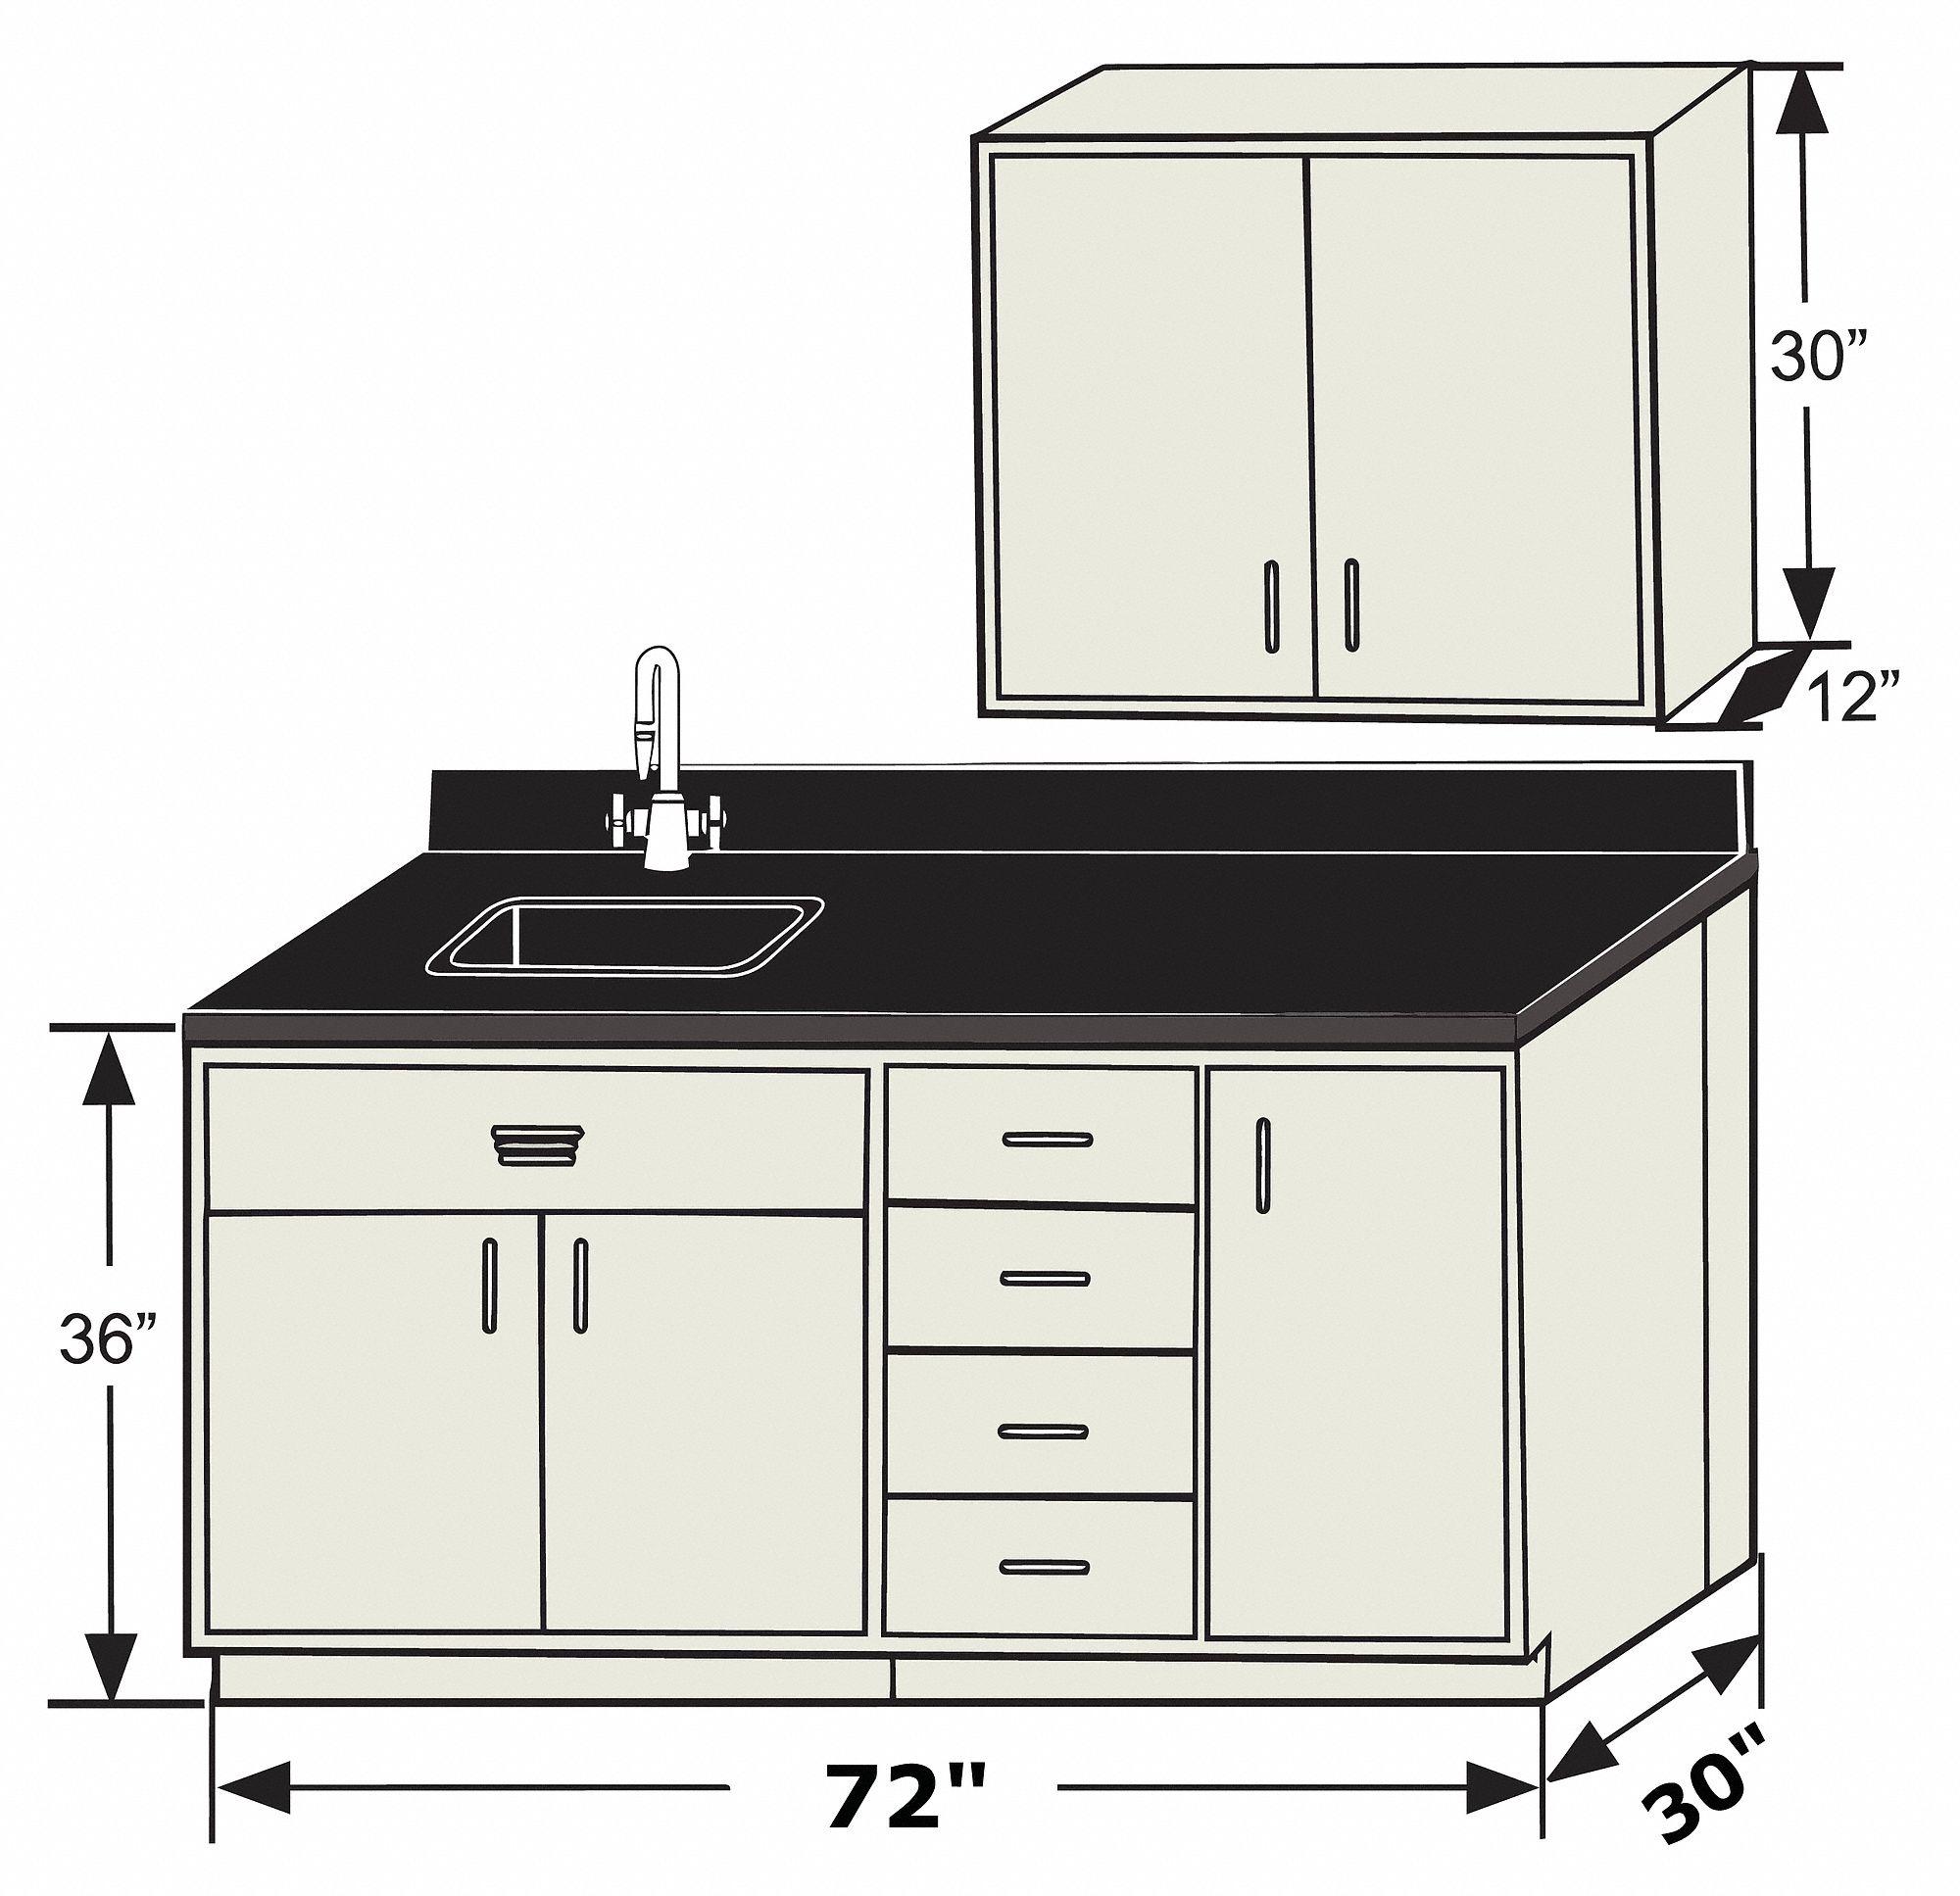 Hemco 72 In X 30 In X 36 In Phenolic Base Cabinet Silver Beige 410p25 70423 Grainger